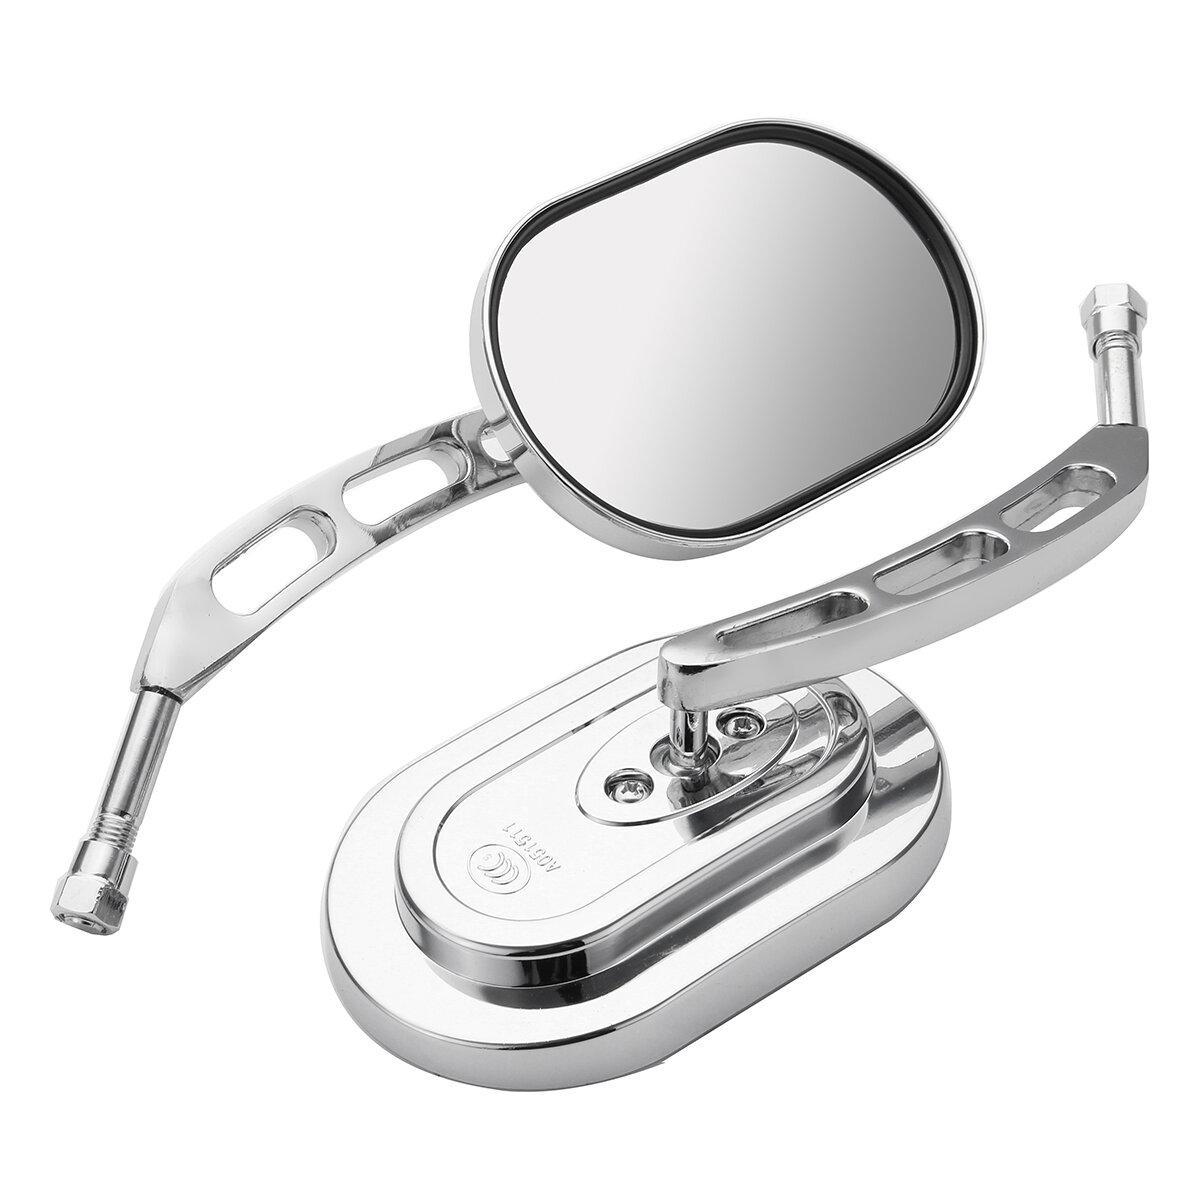 10mm Universal Chrome Motorcycle Mirrors Rear View Side Mirror For Harley/Suzuki/Honda